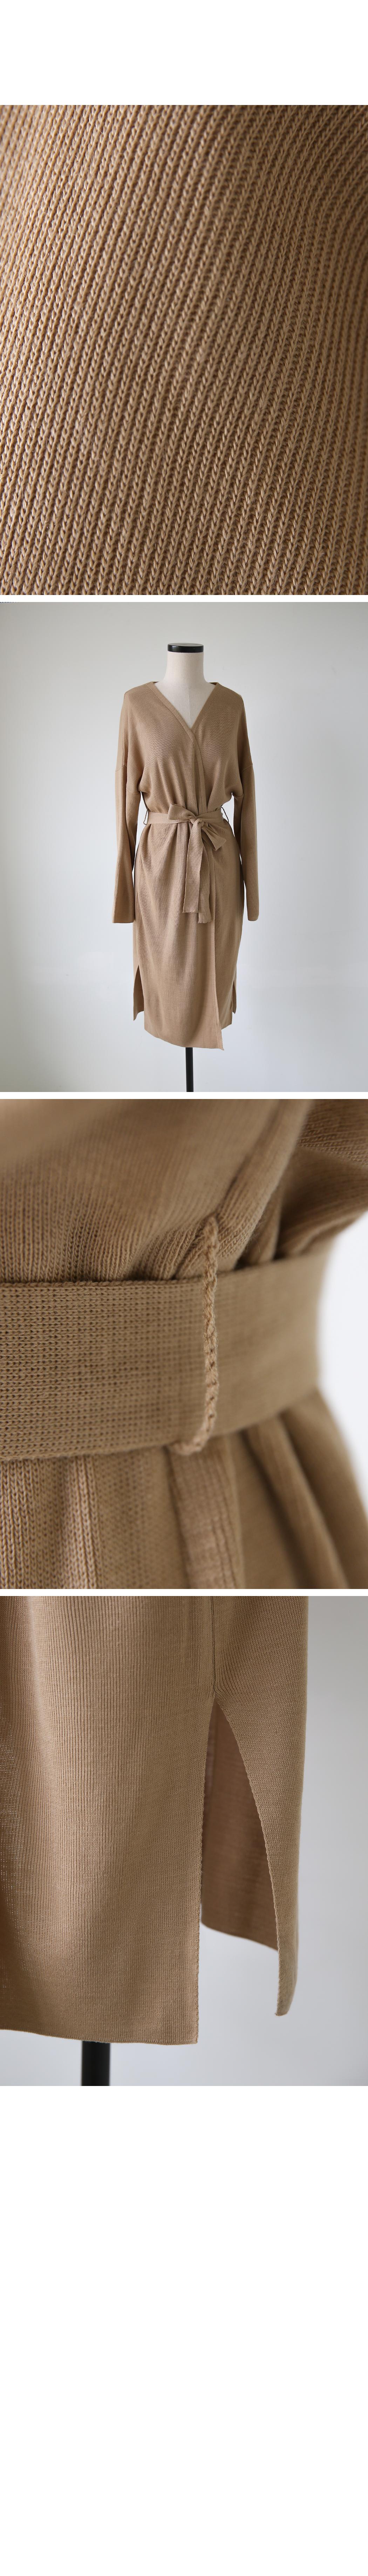 Mood belt slit long cardigan